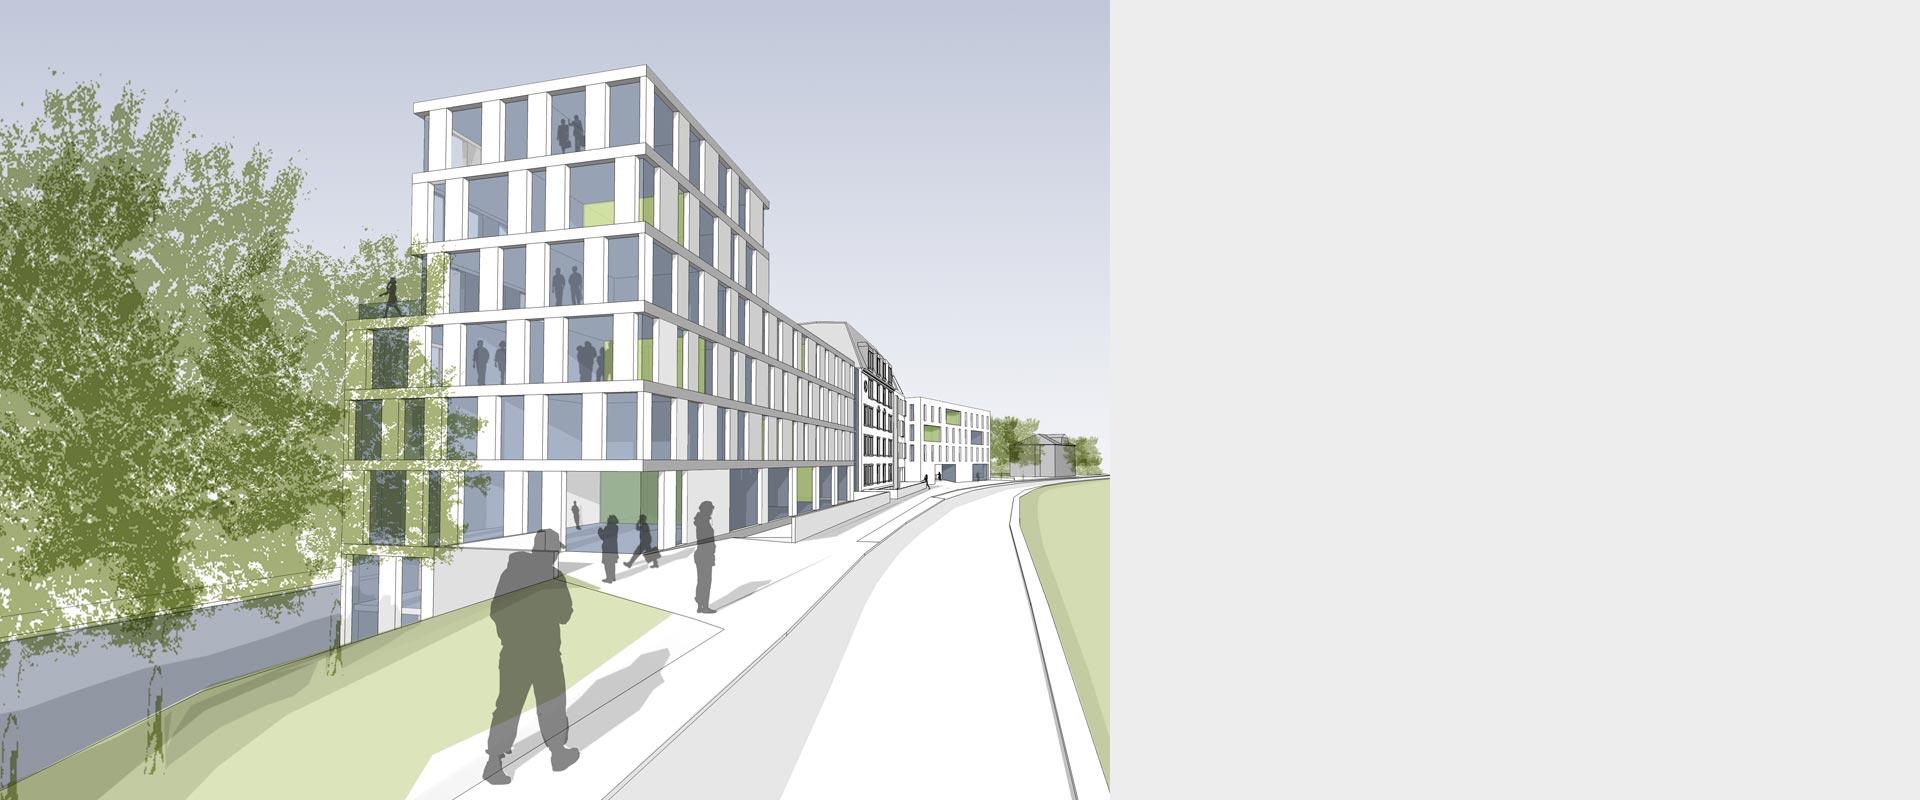 architekturbuero_henning_musahl_waldshut_stadtschloss_03